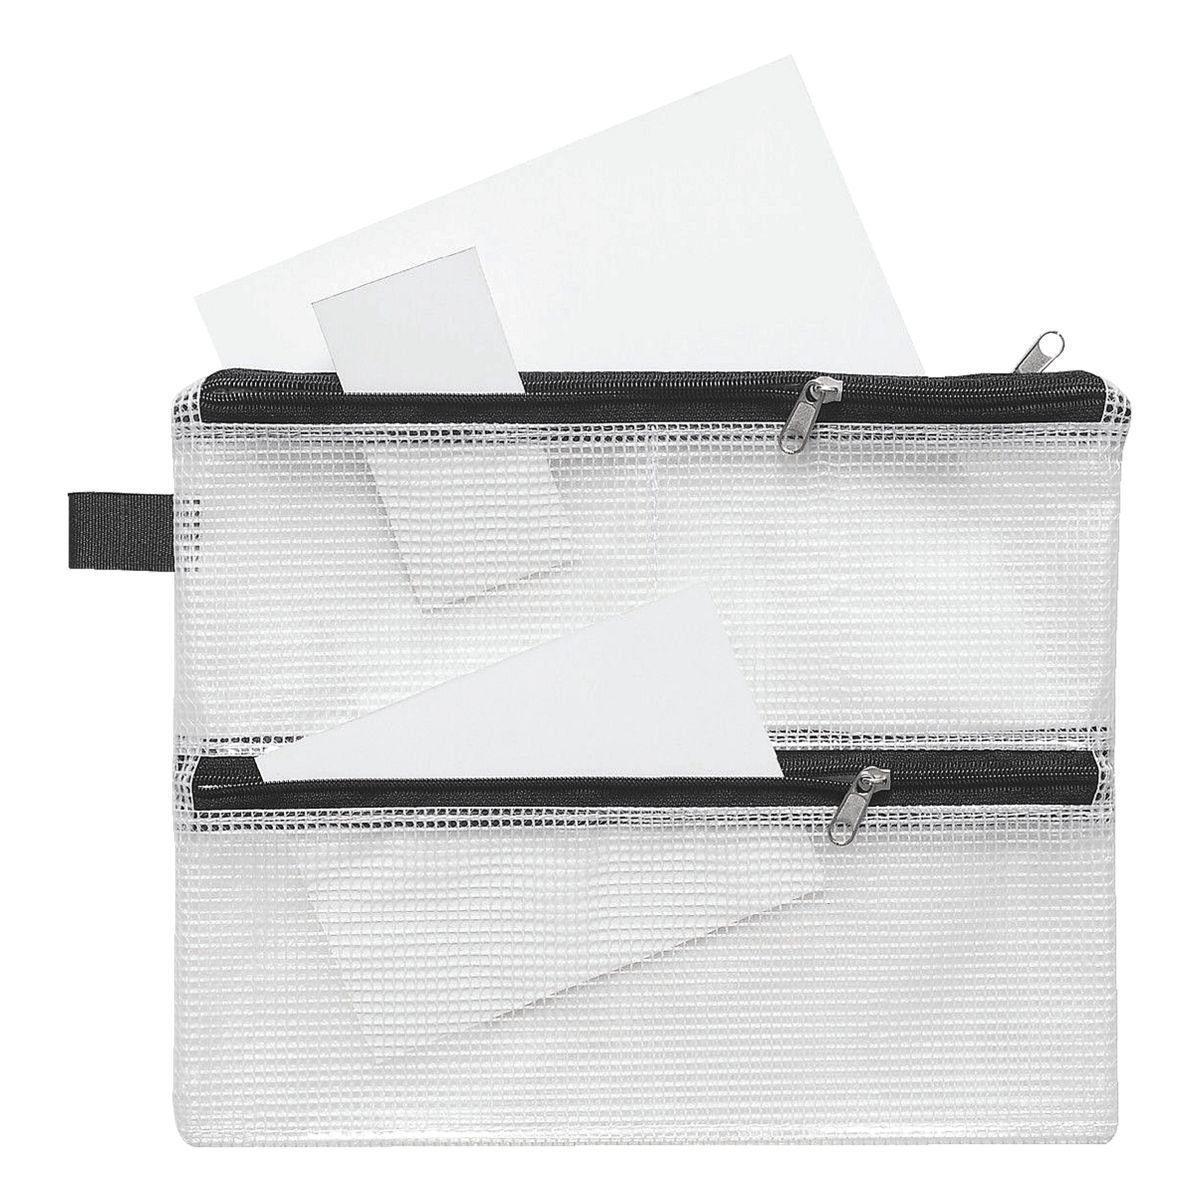 Foldersys Reißverschlussbeutel